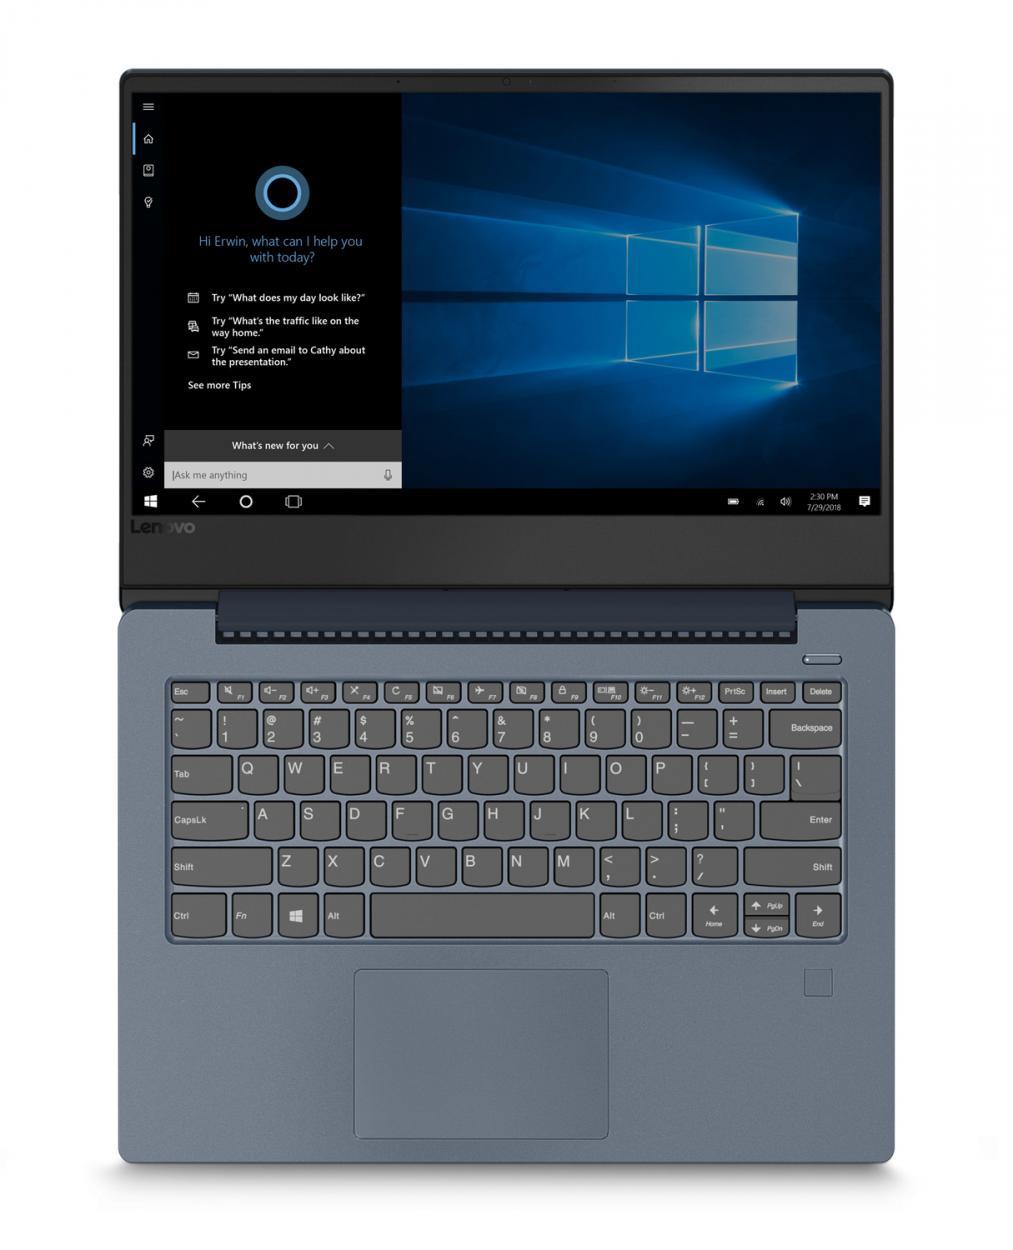 Ordinateur portable Lenovo IdeaPad 330S-14IKB (1) Bleu Nuit - SSD - photo 5